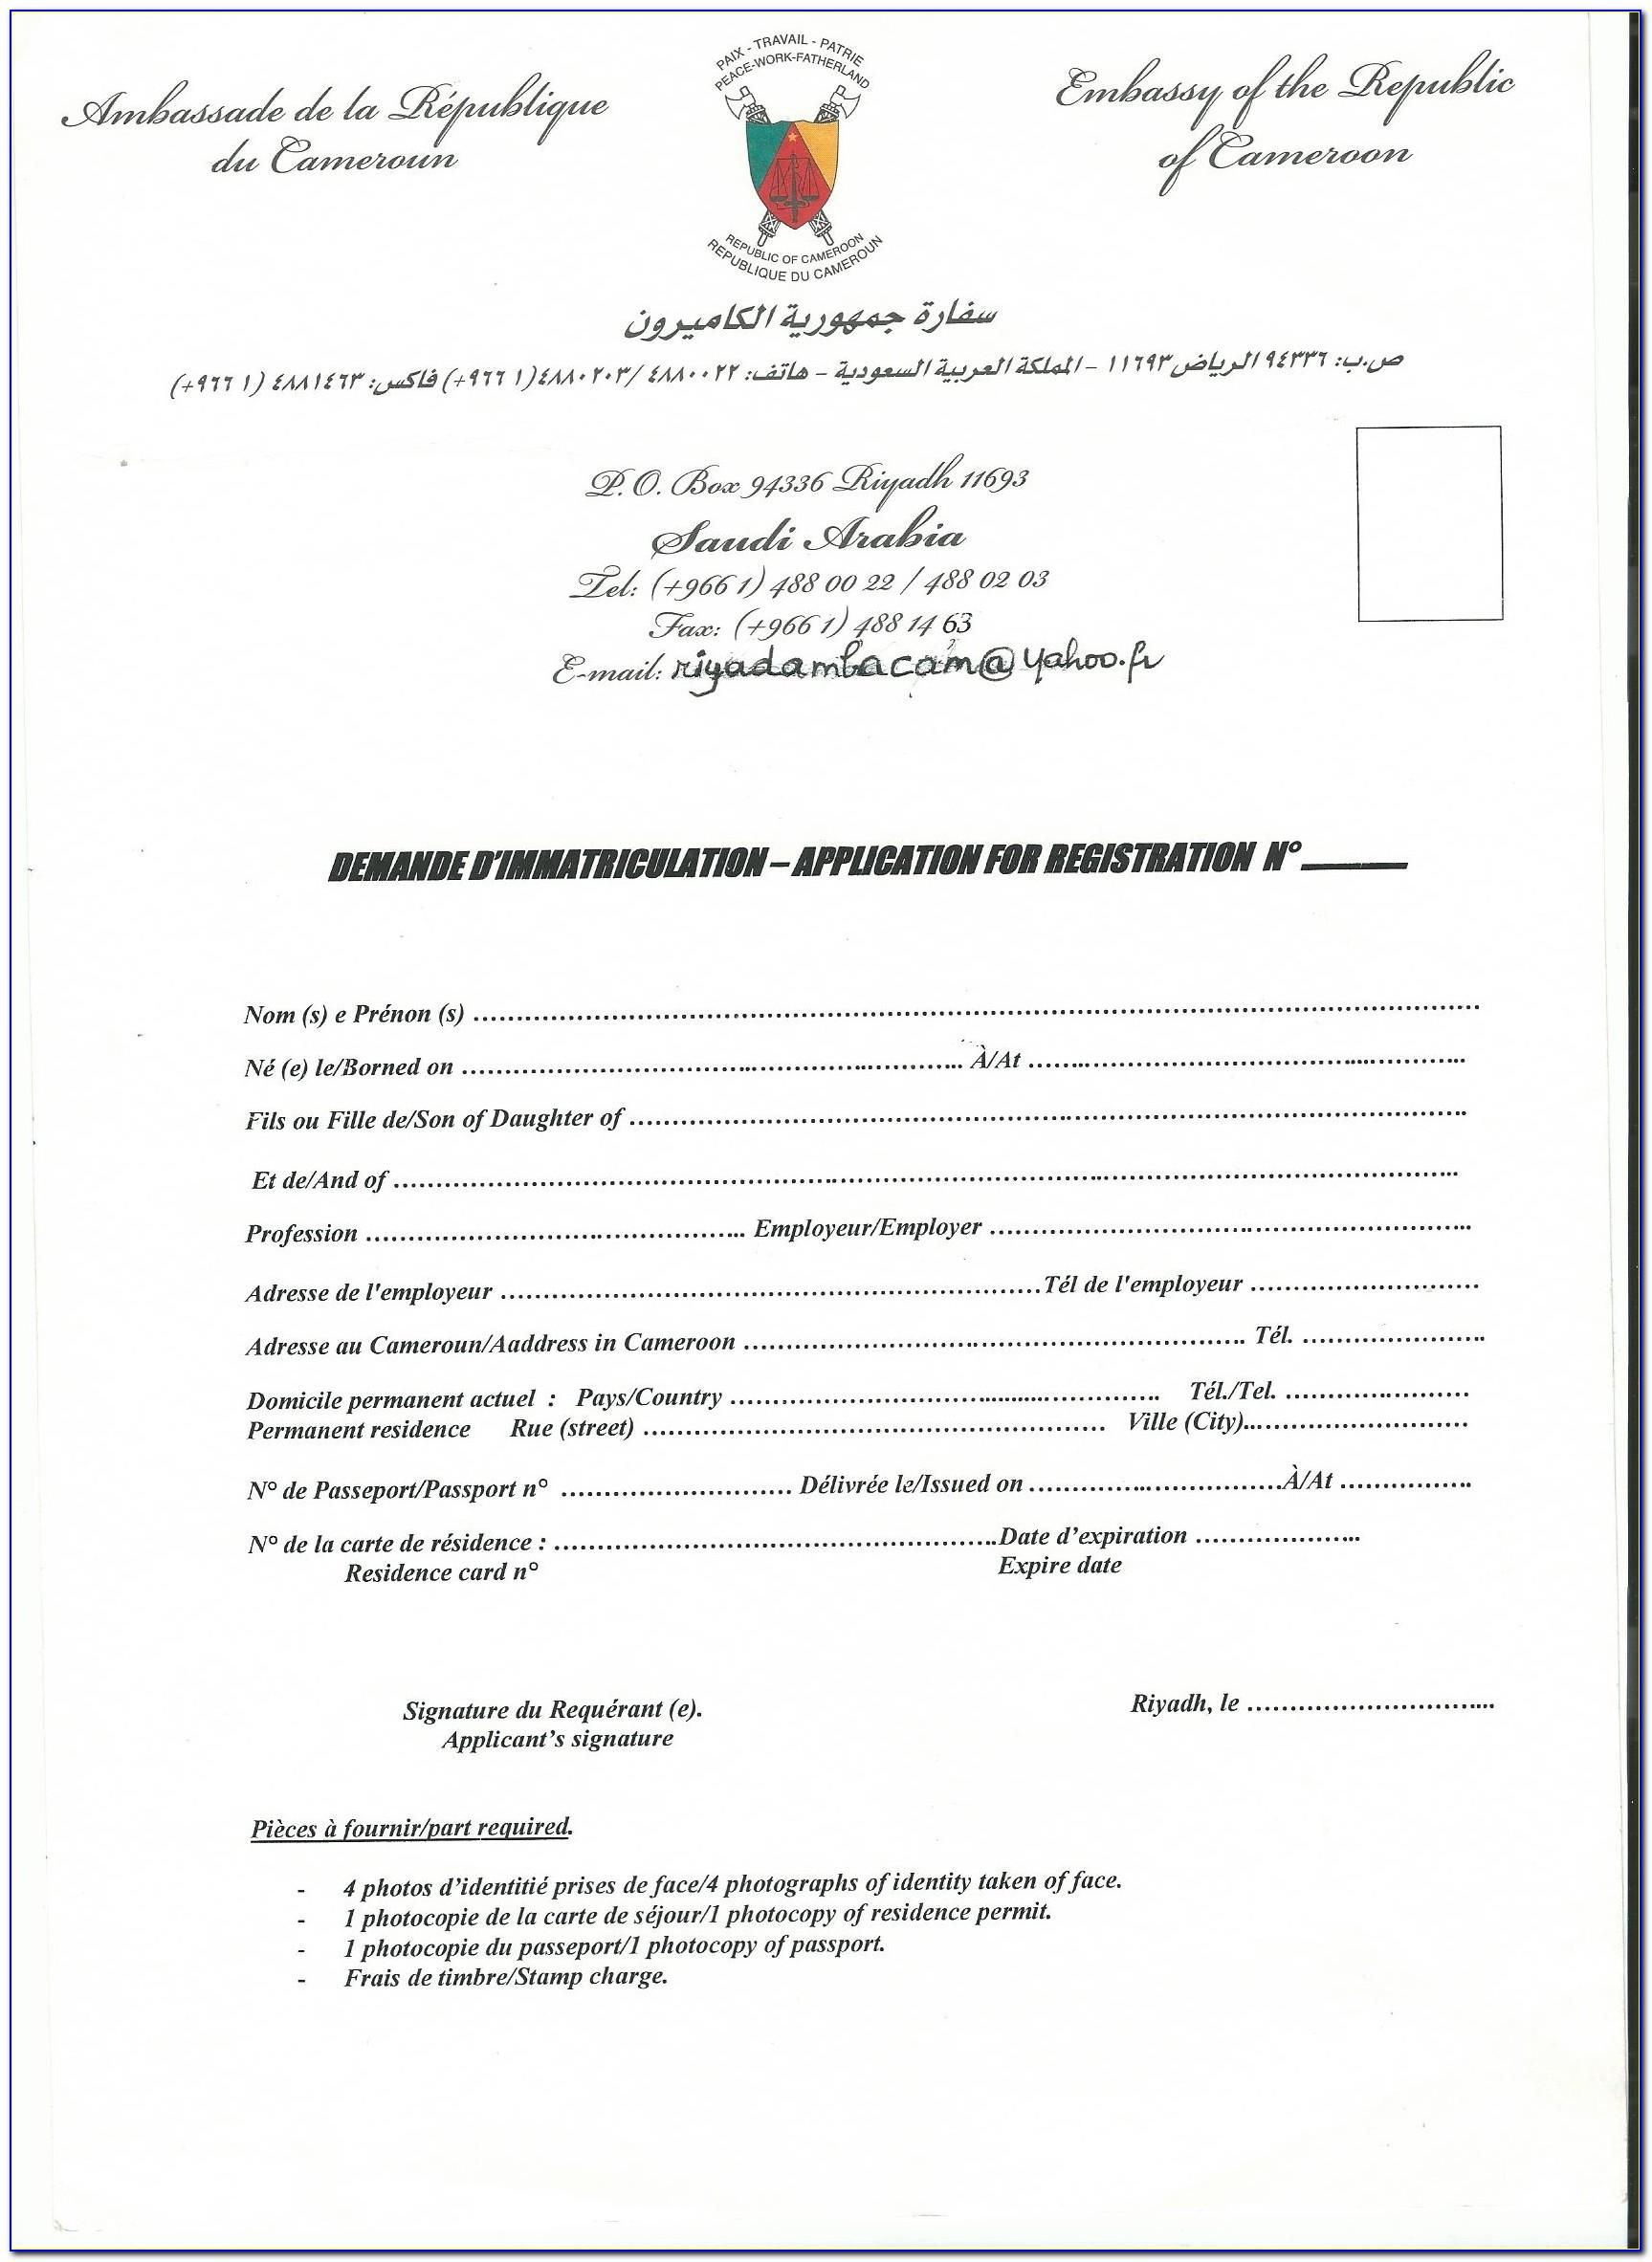 Ghana Embassy Passport Renewal Forms